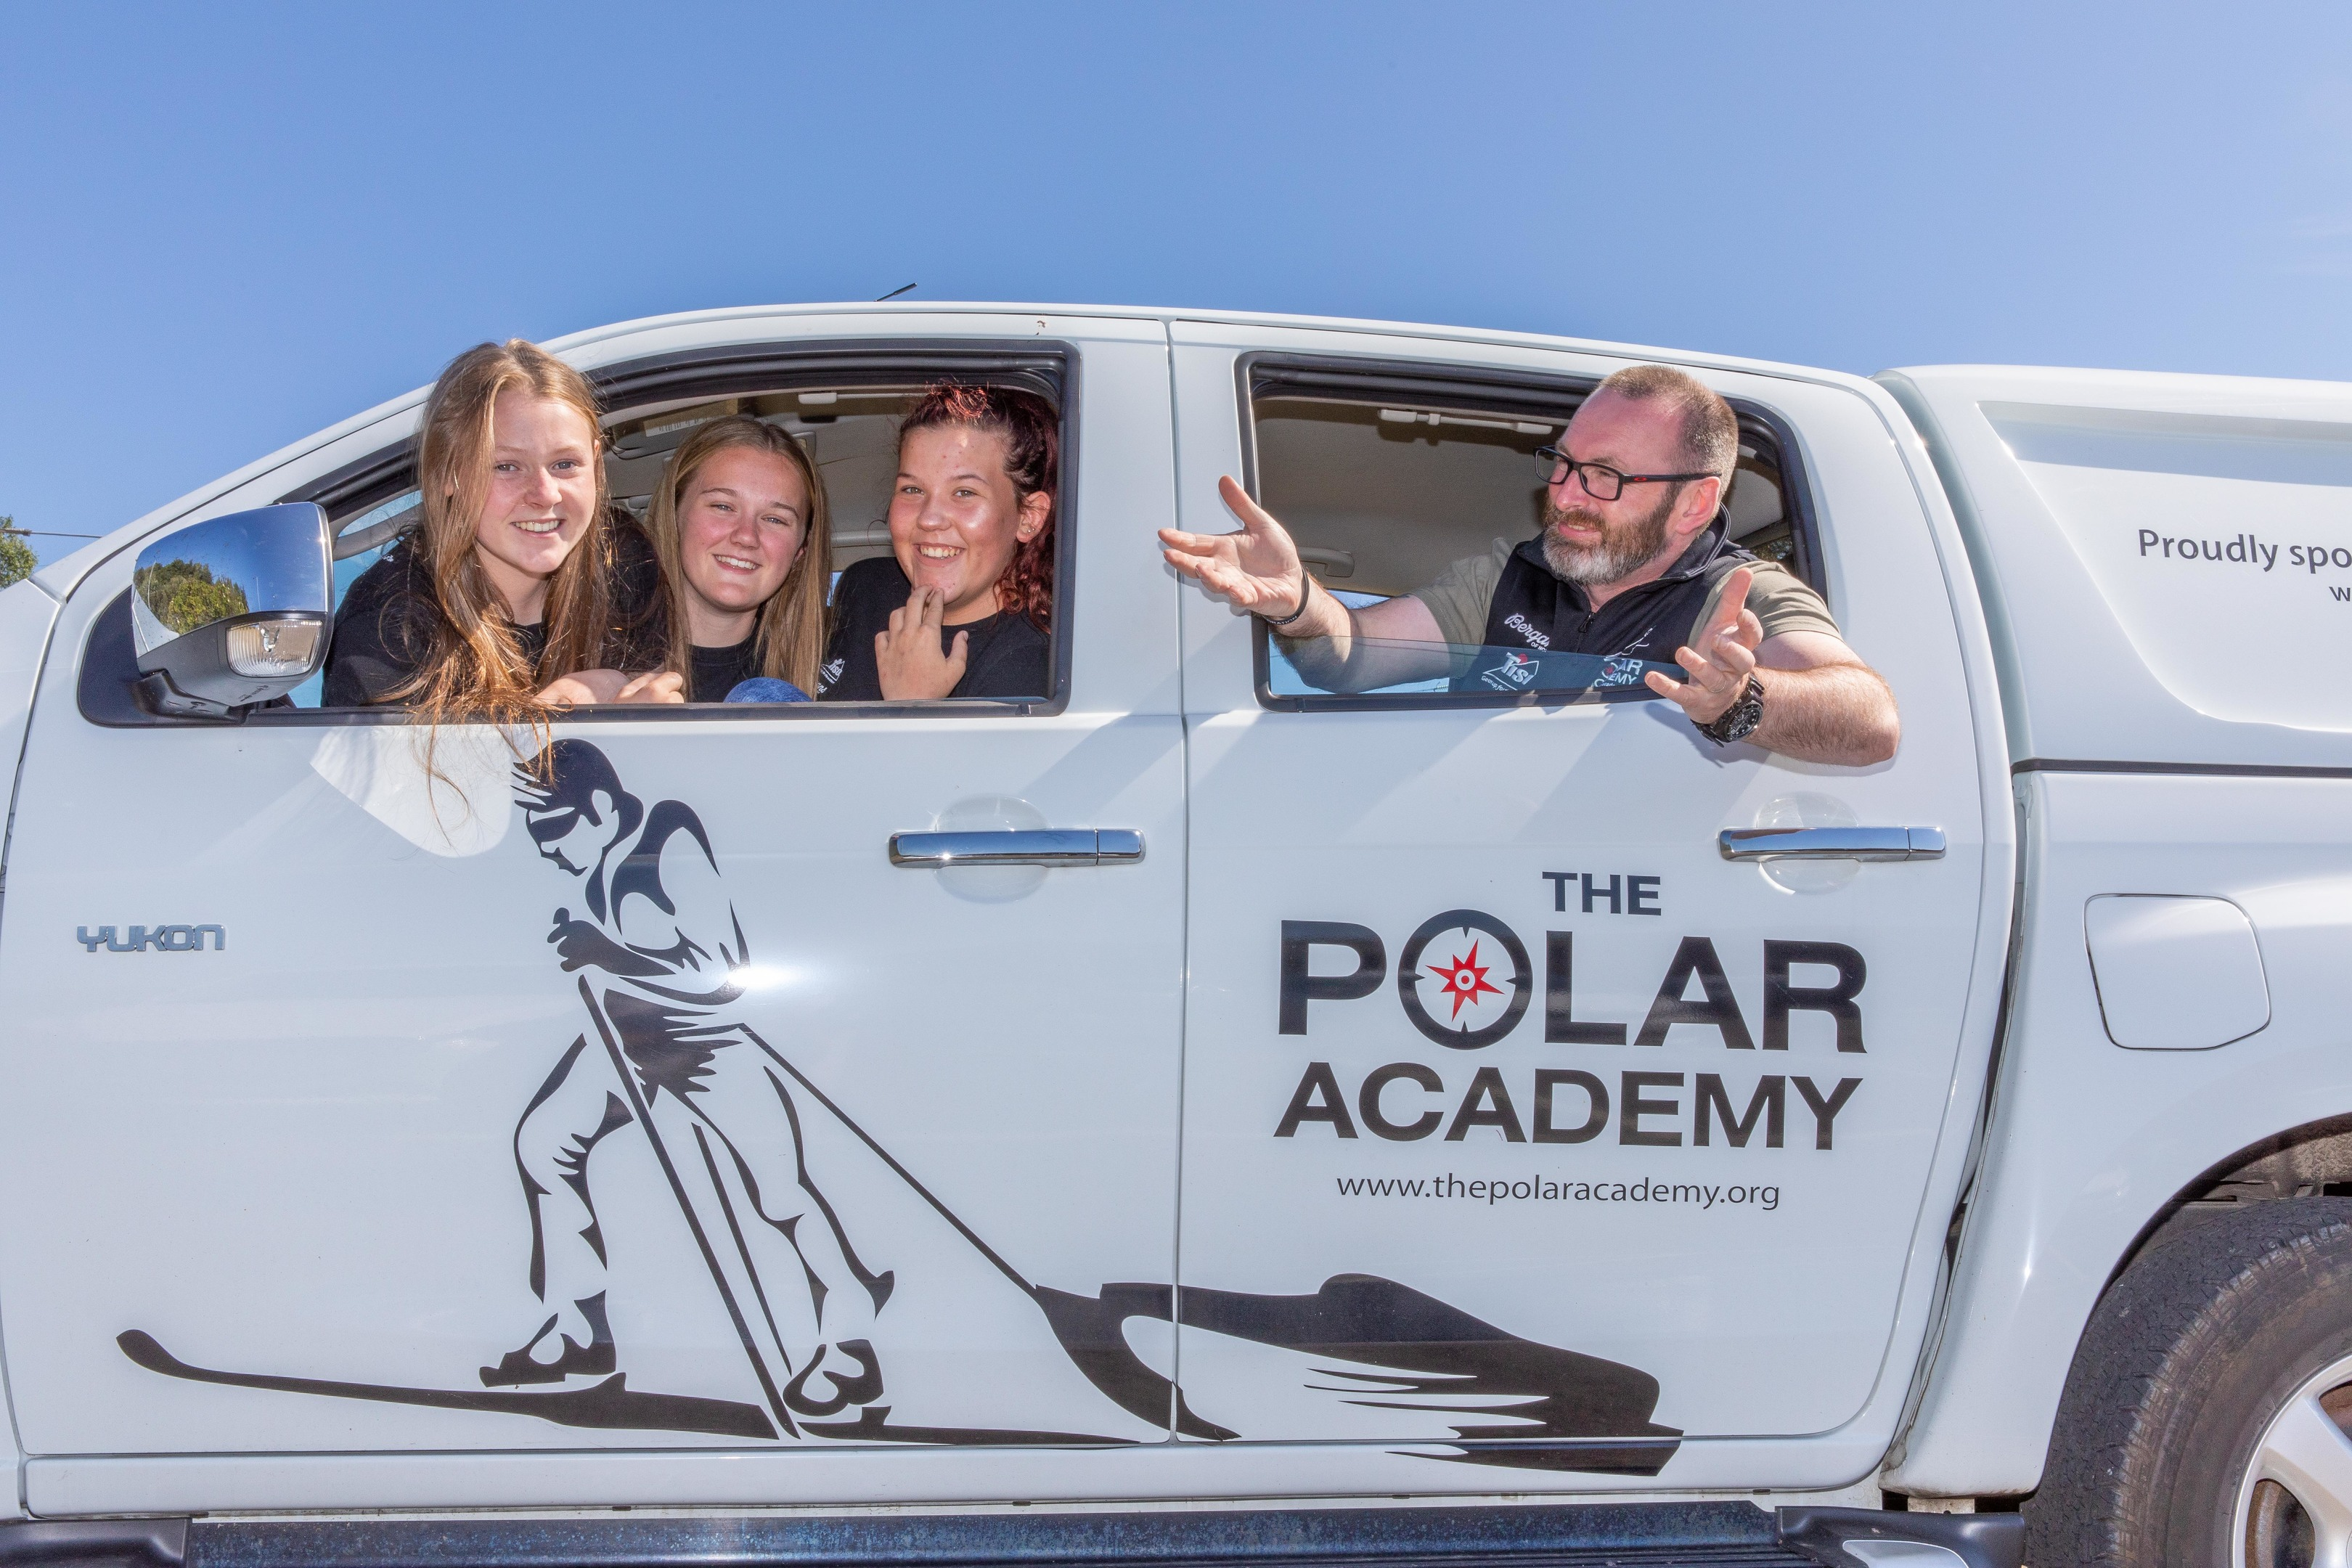 Craig Mathieson (Polar Academy) with Lochgelly High Pupils, Carla Masterton, Hannah Reid and Lauren Scott